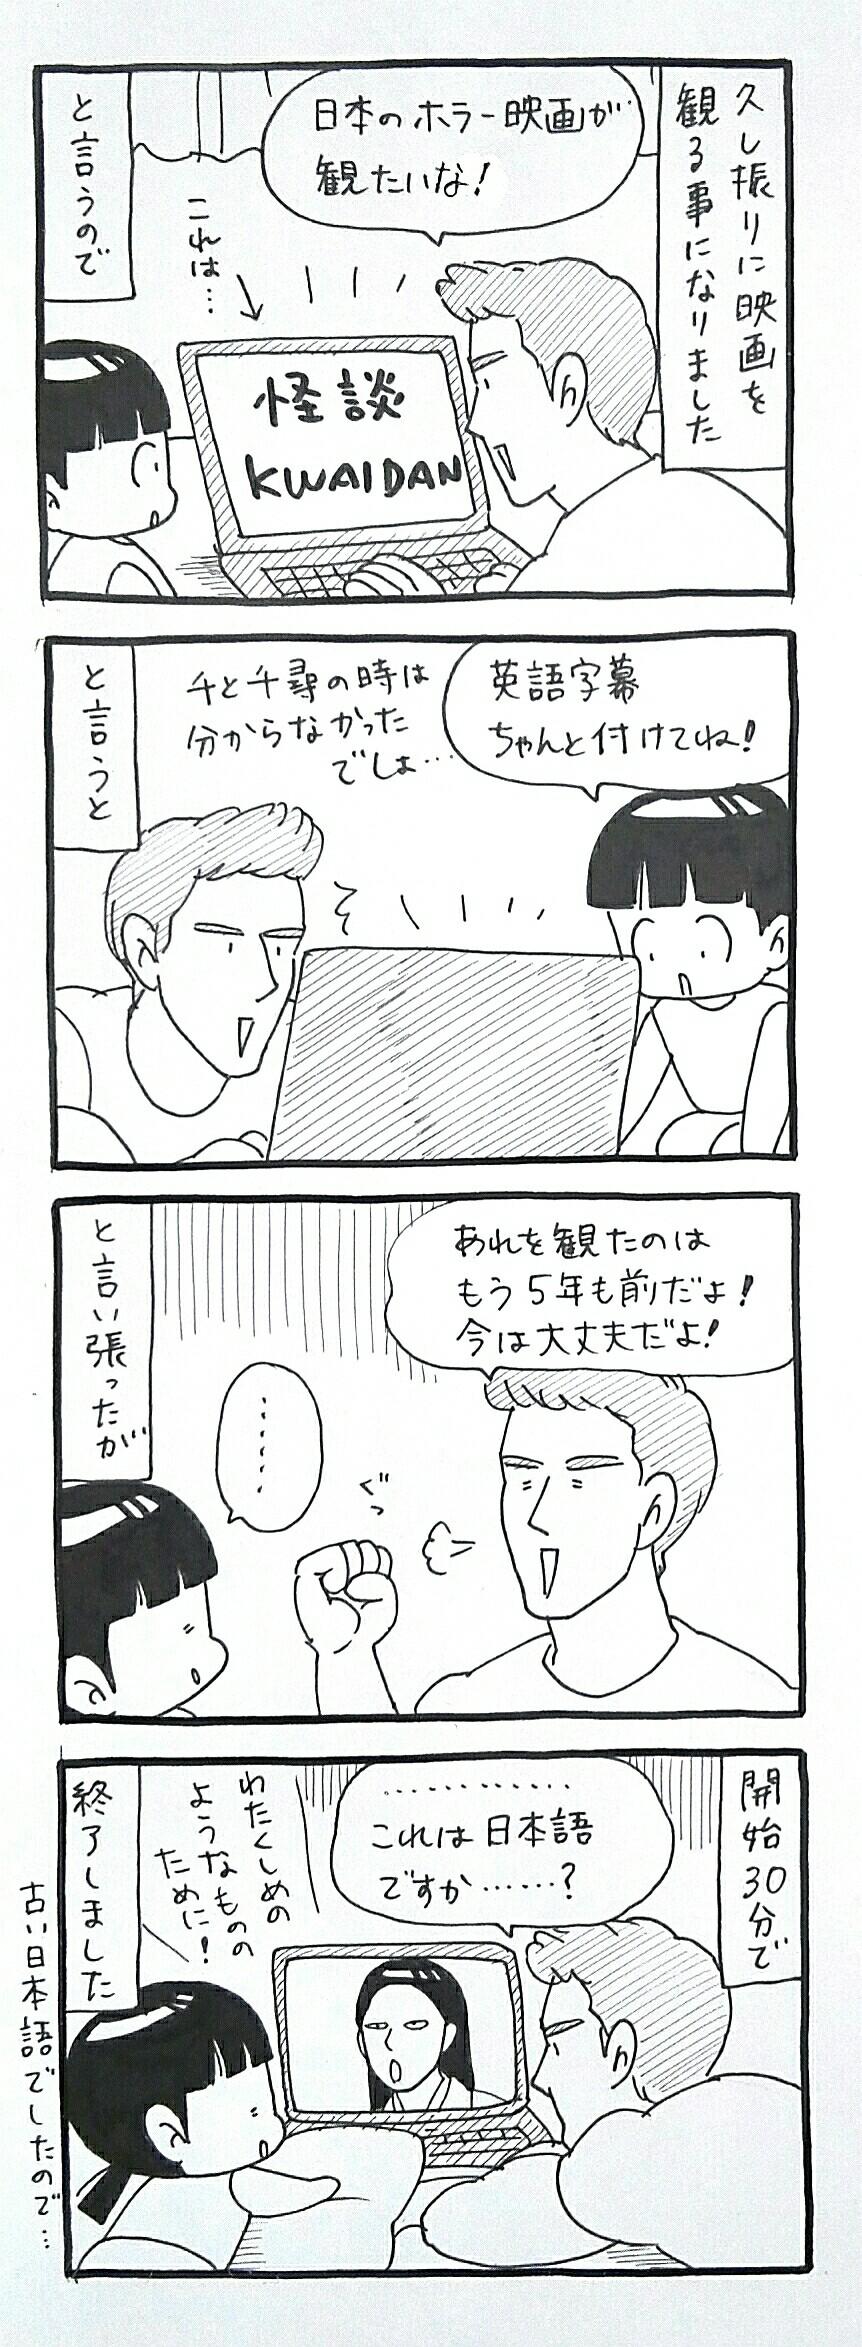 f:id:Shoko_drawing:20190618145800j:plain